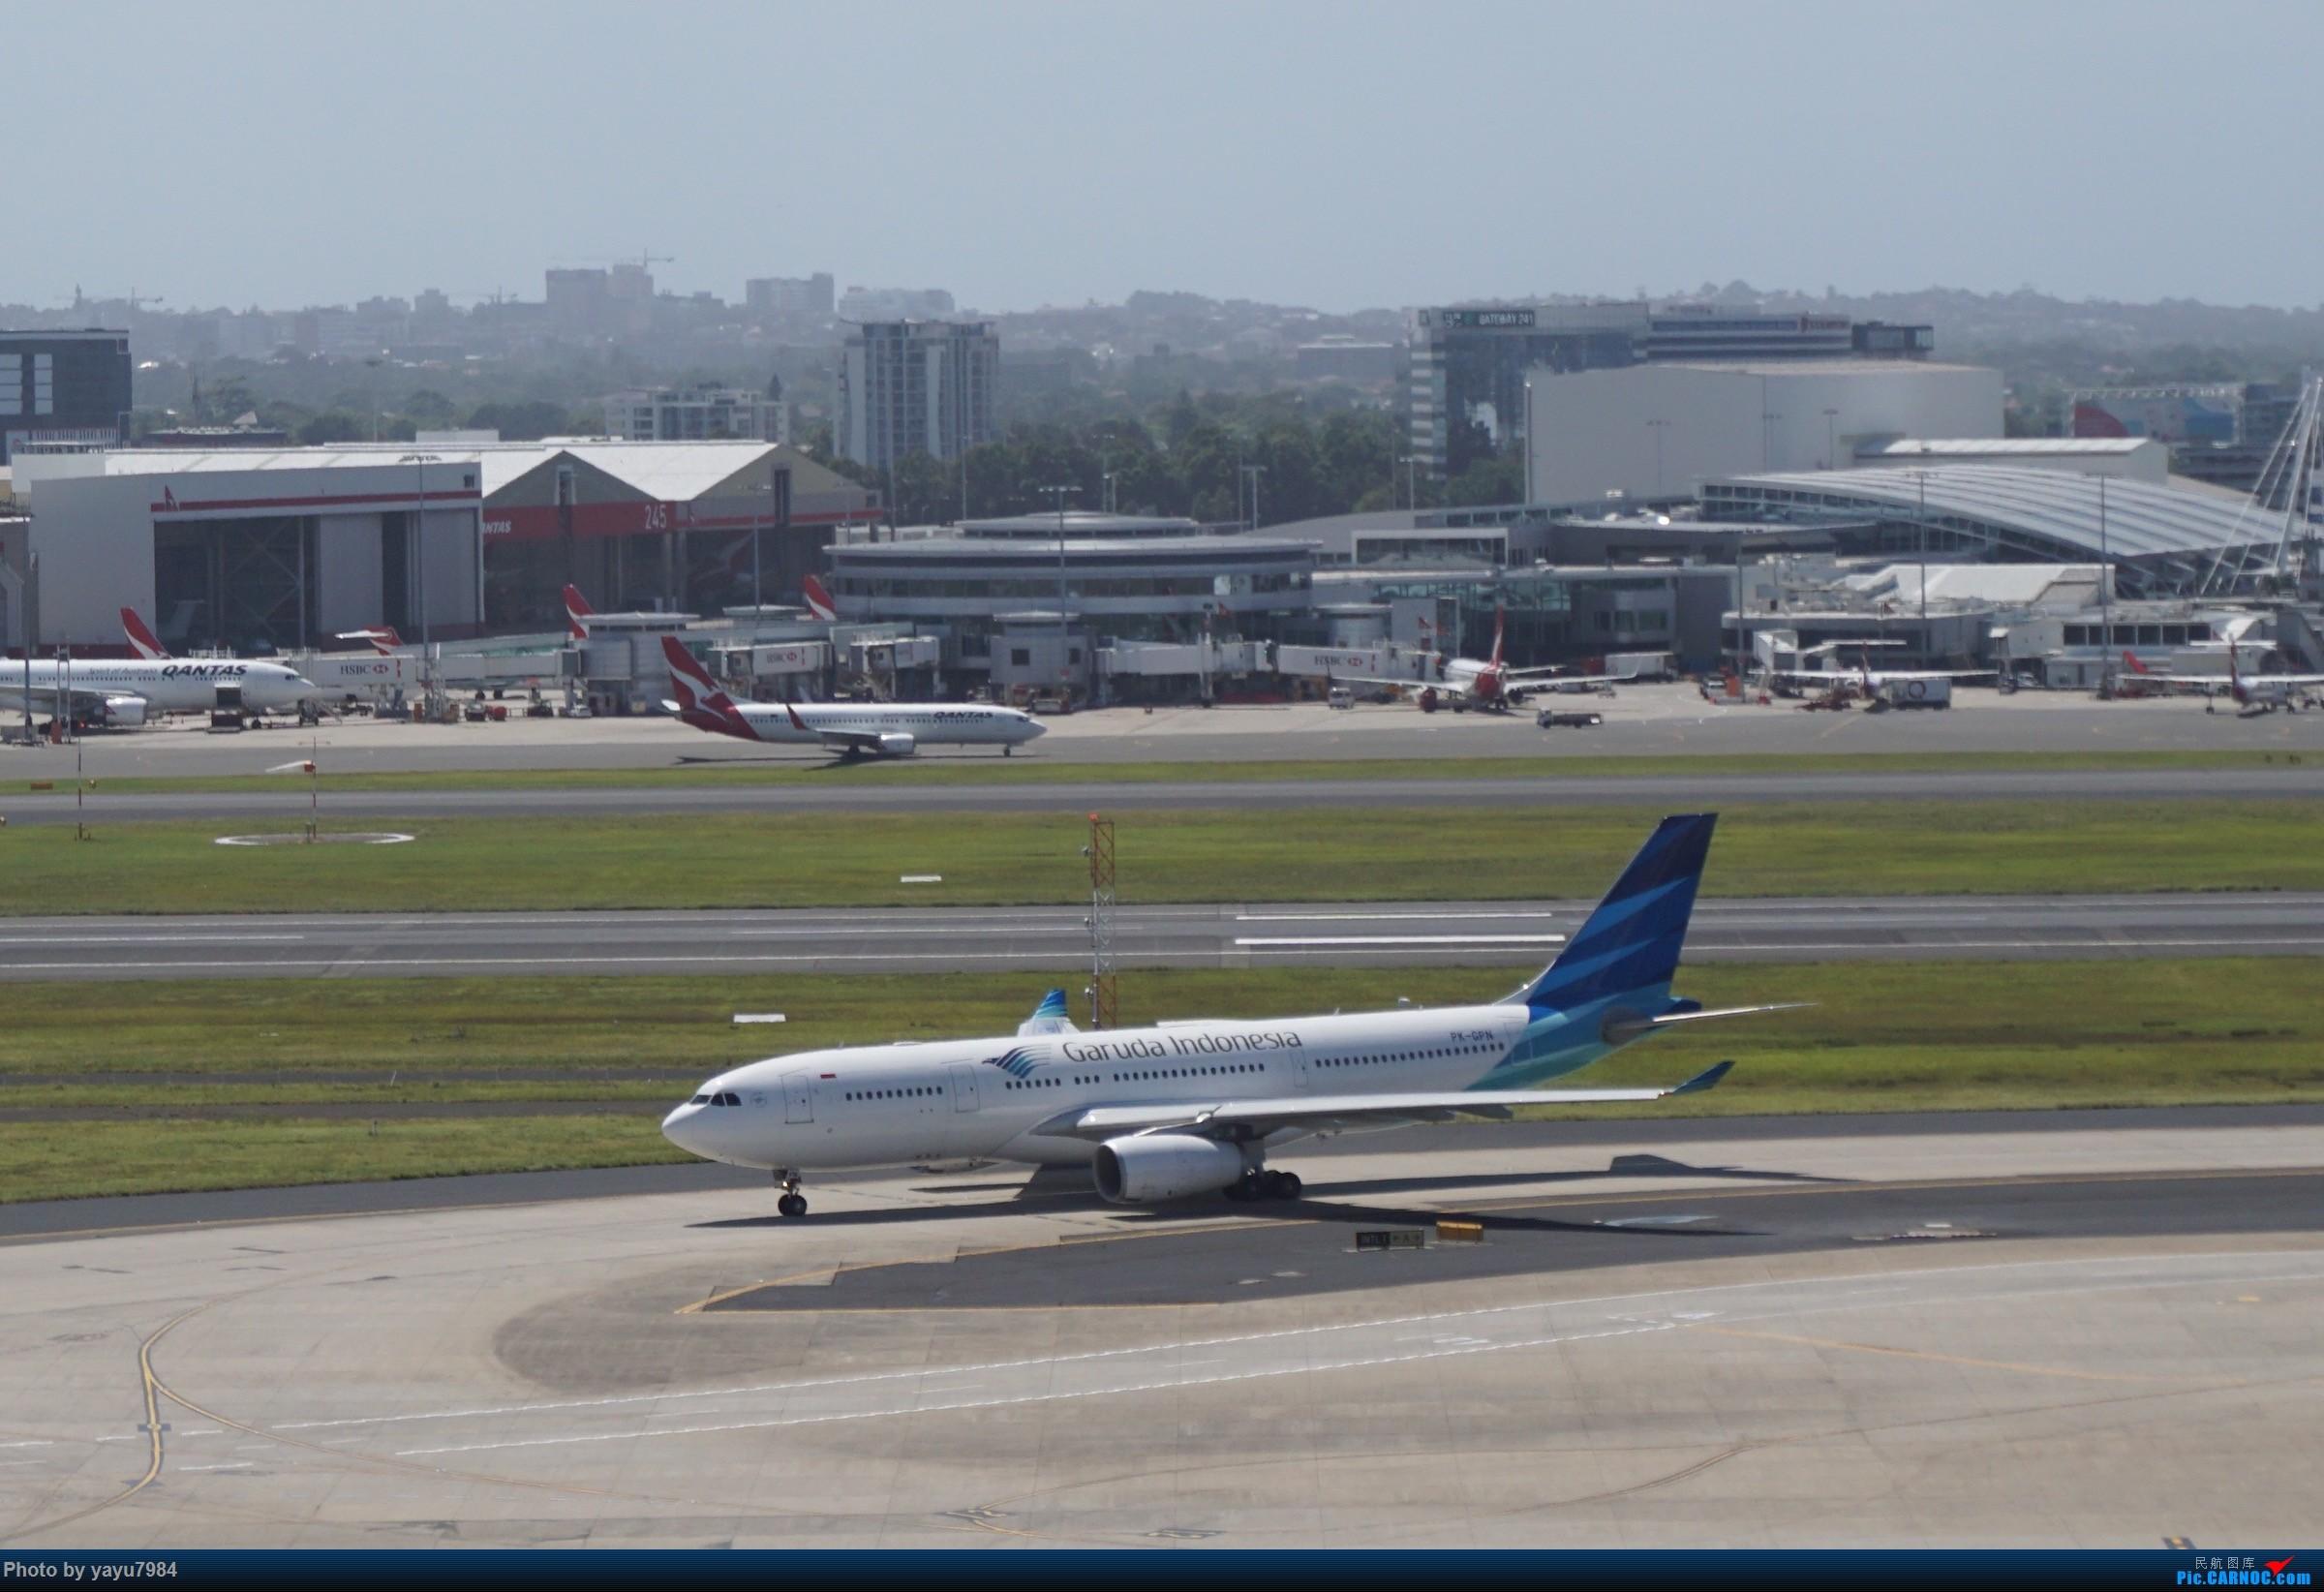 Re:[原创][SYD] 停车楼顶看宽体 AIRBUS A330-200 PK-GPN 澳大利亚悉尼金斯福德·史密斯机场